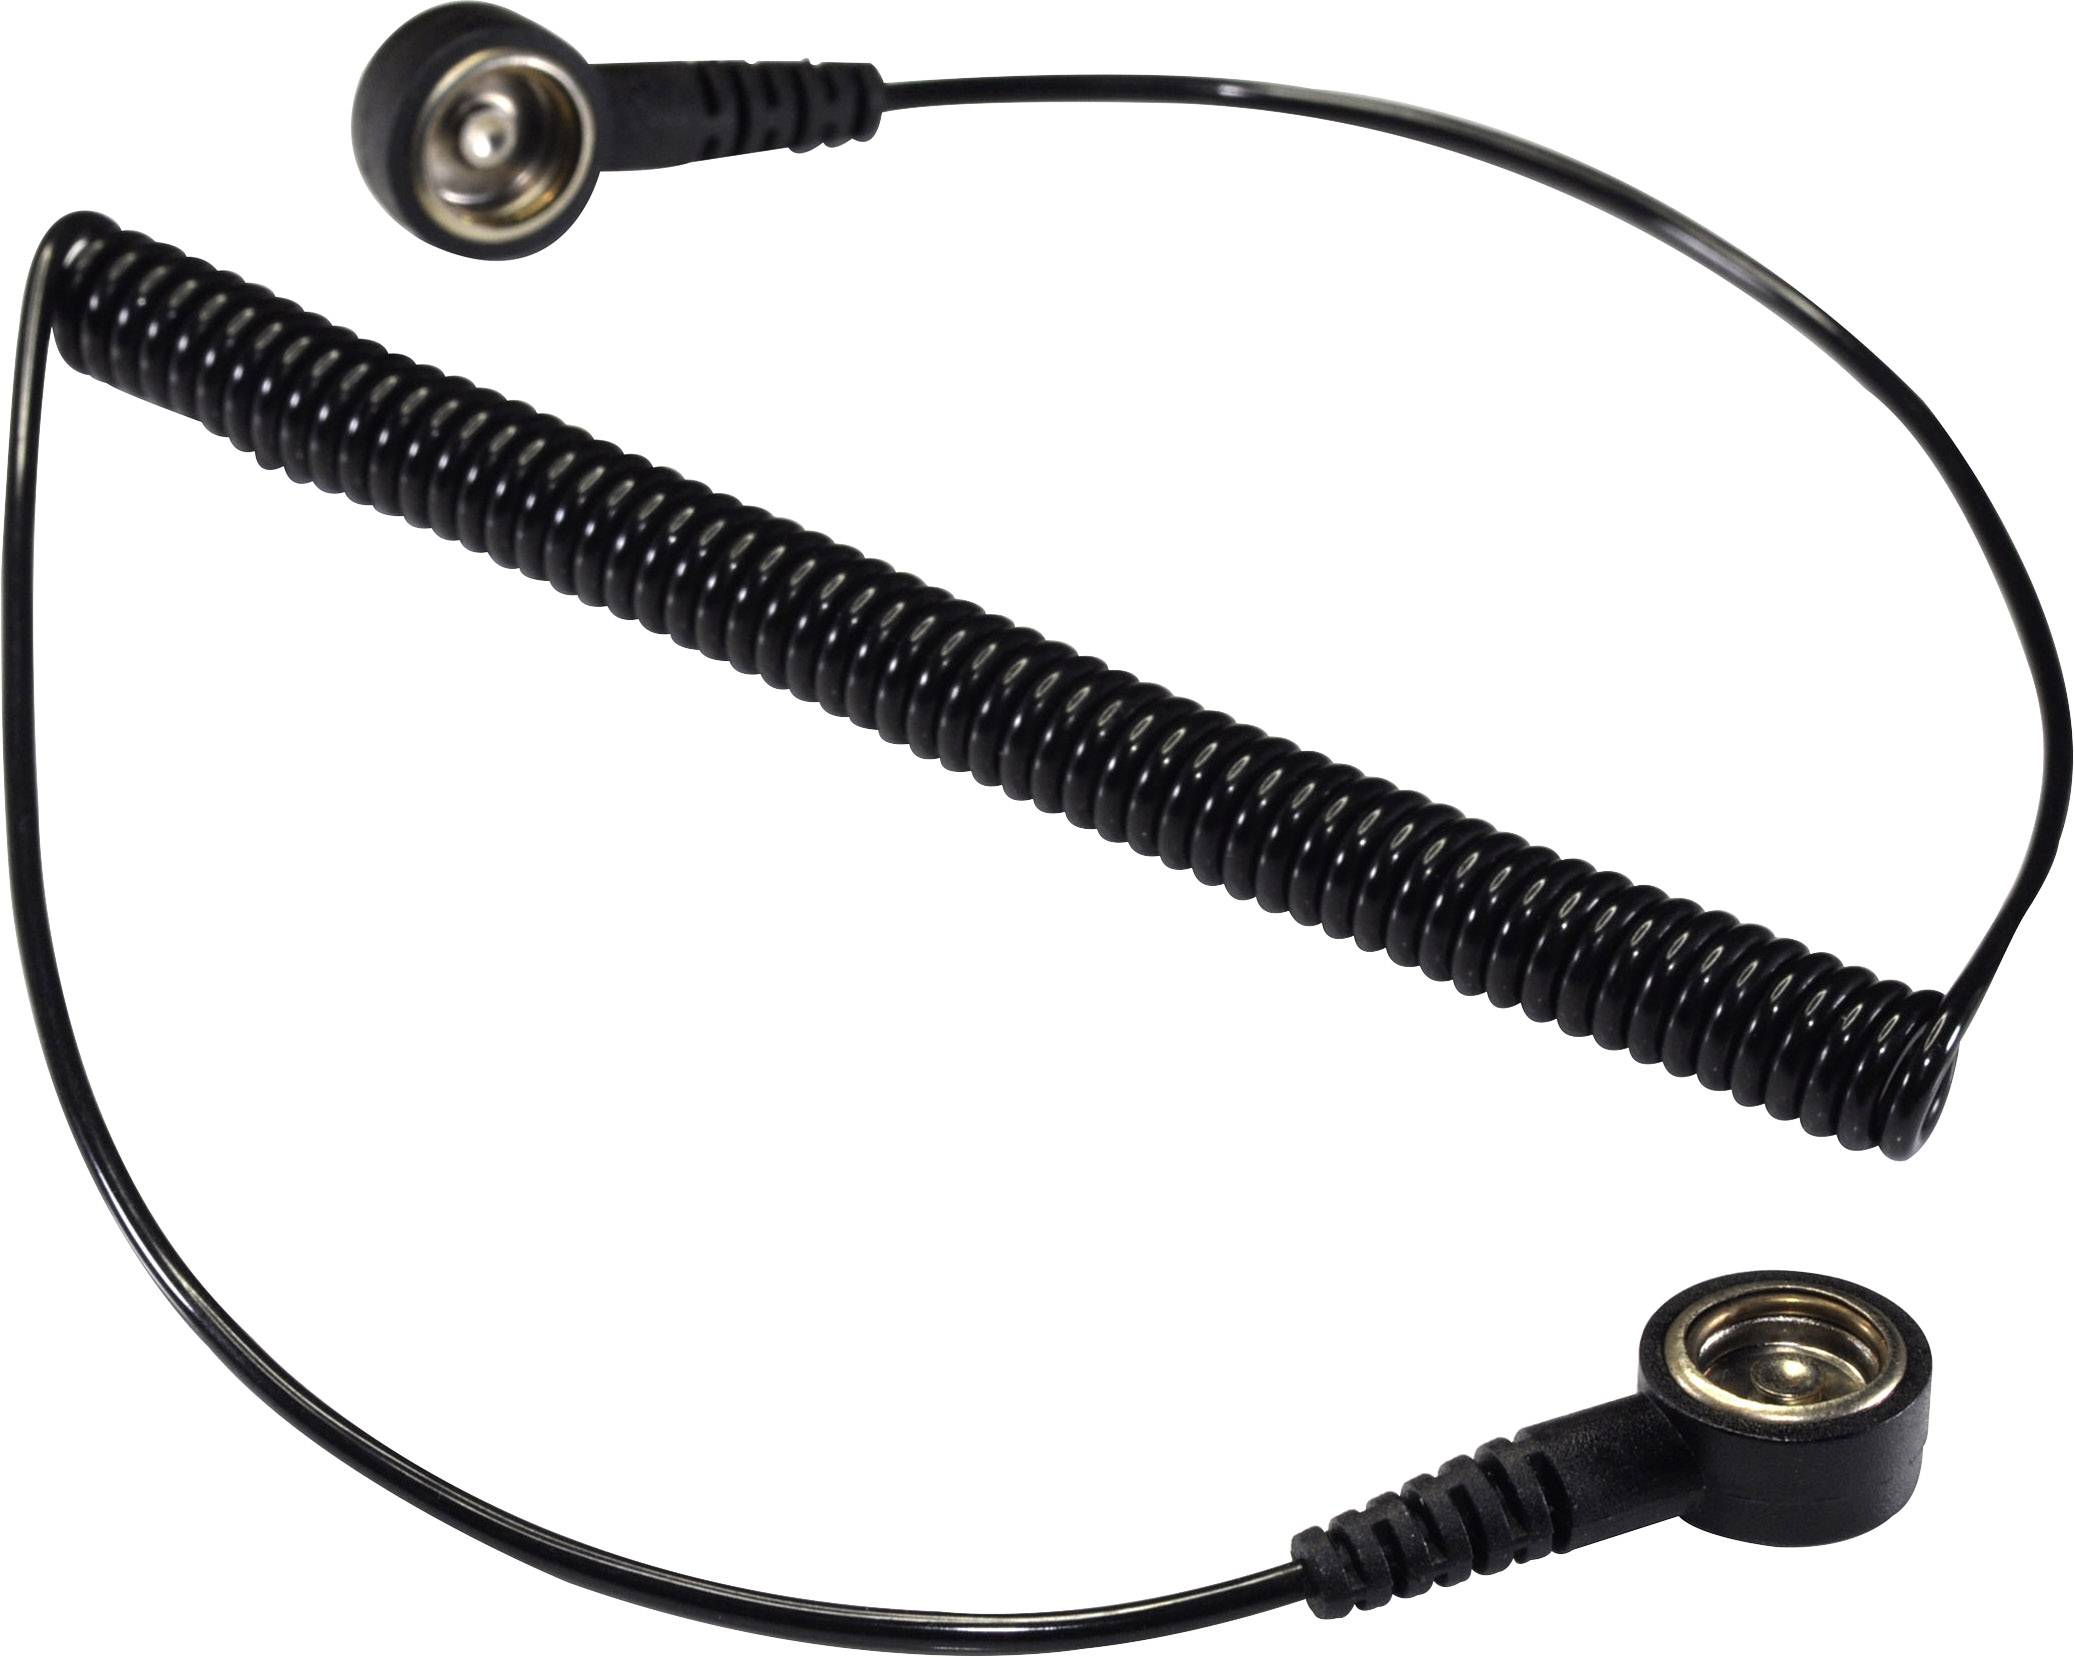 ESD uzemňovací kábel Conrad Components SpKL-10-366-KK, 3.66 m